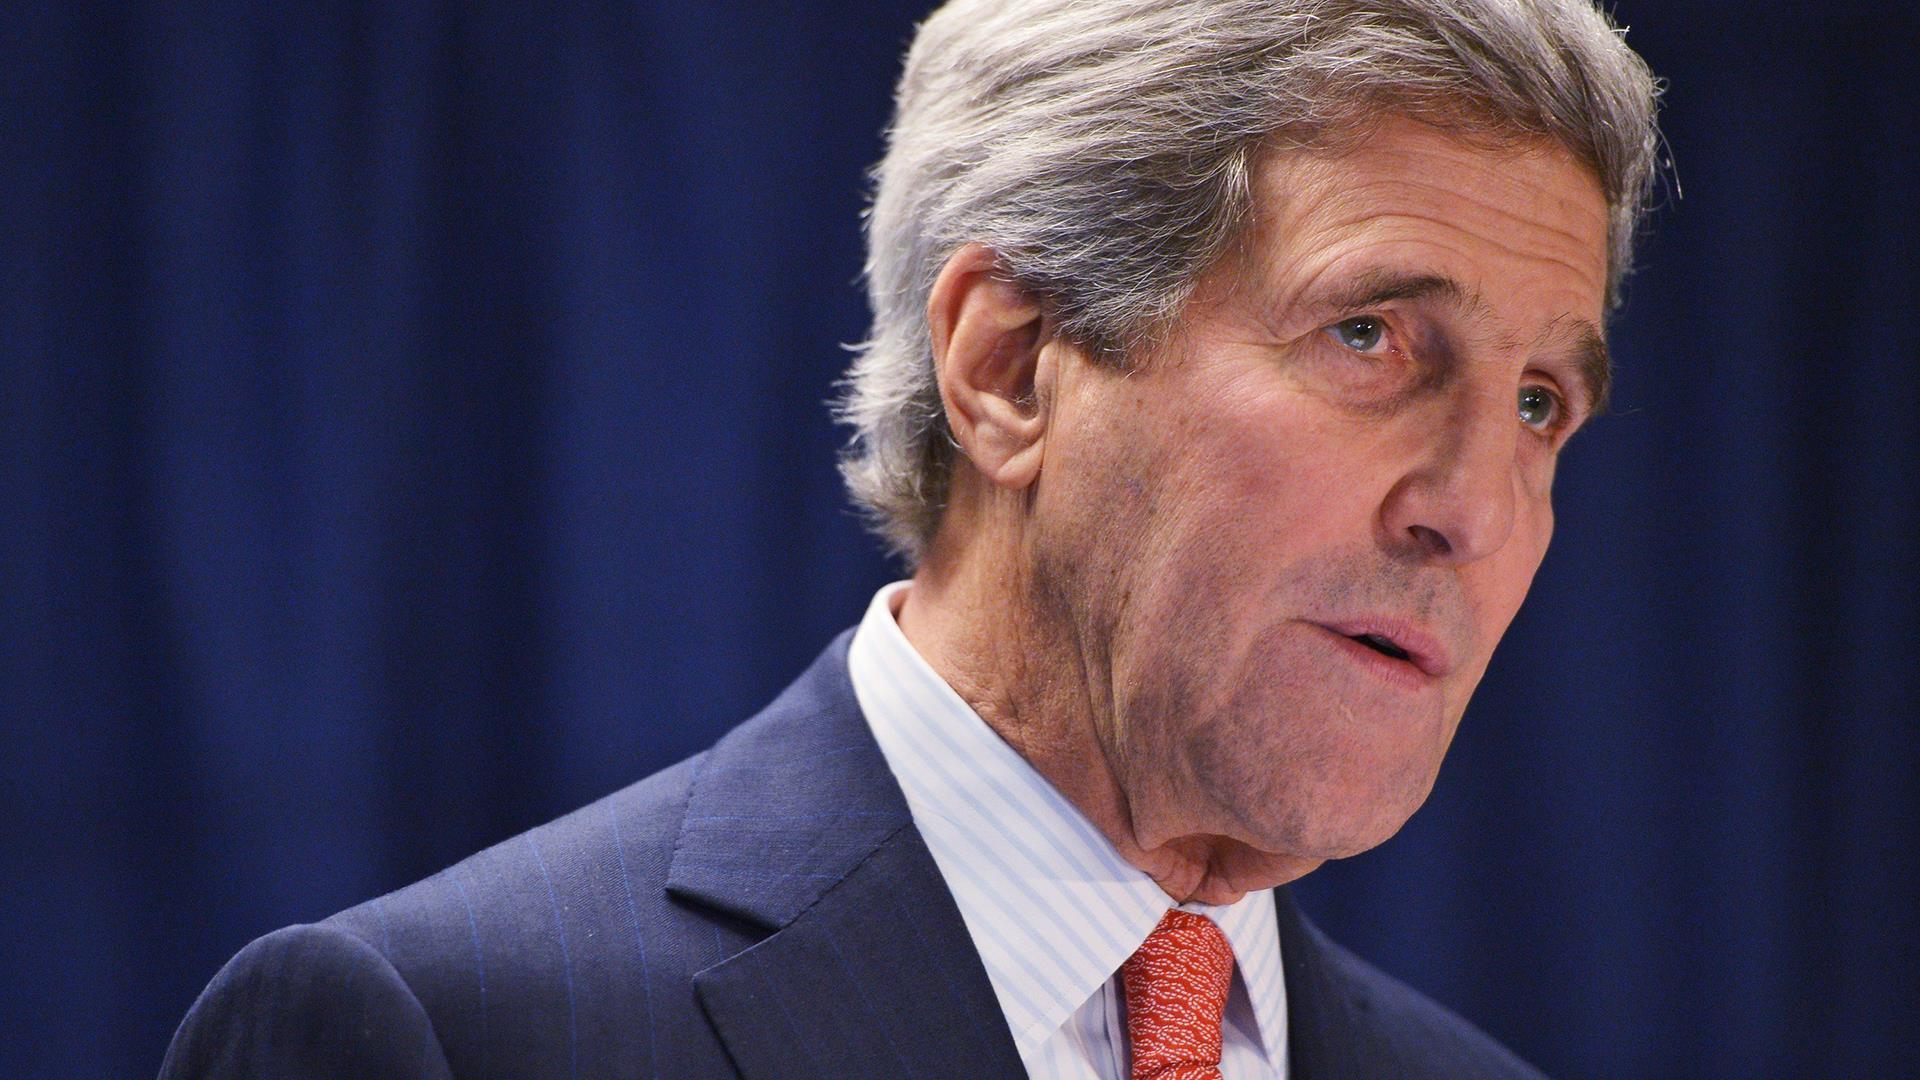 LIVE VIDEO: Sec. Kerry speaks at U.S....